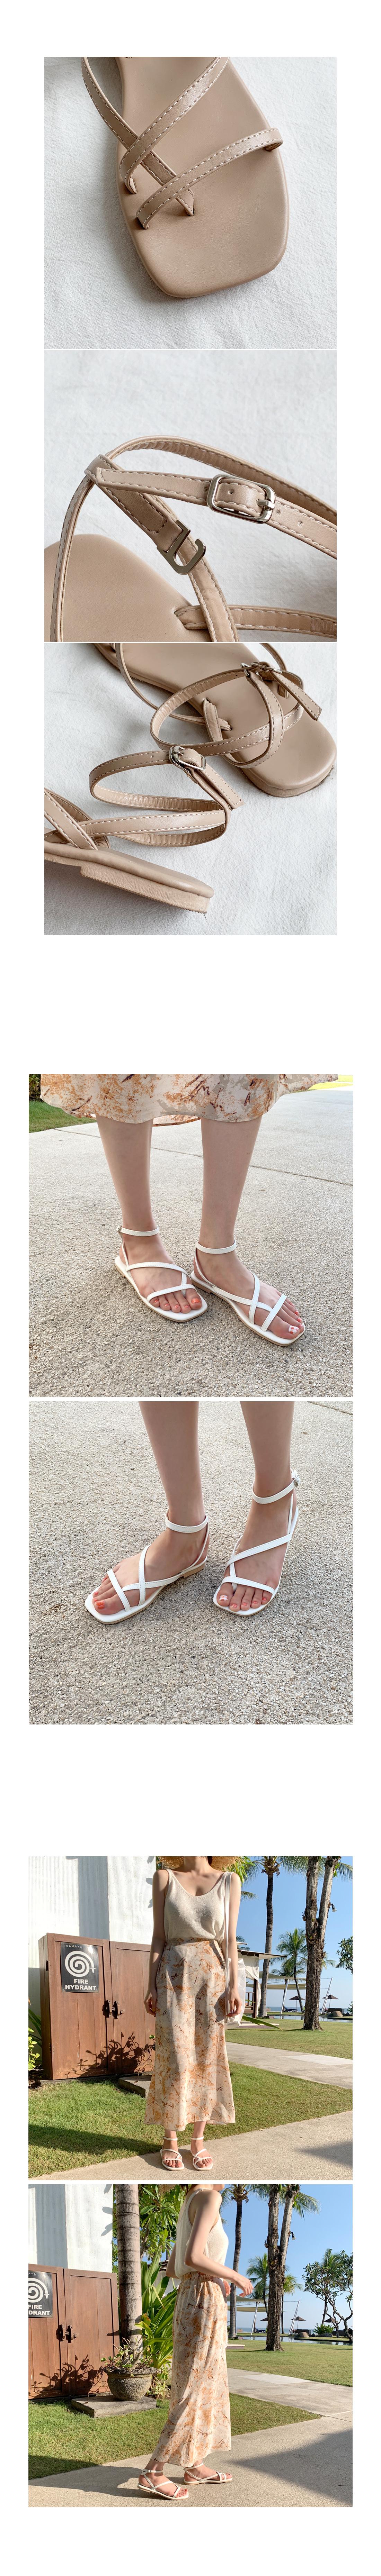 Applebee strap sandals